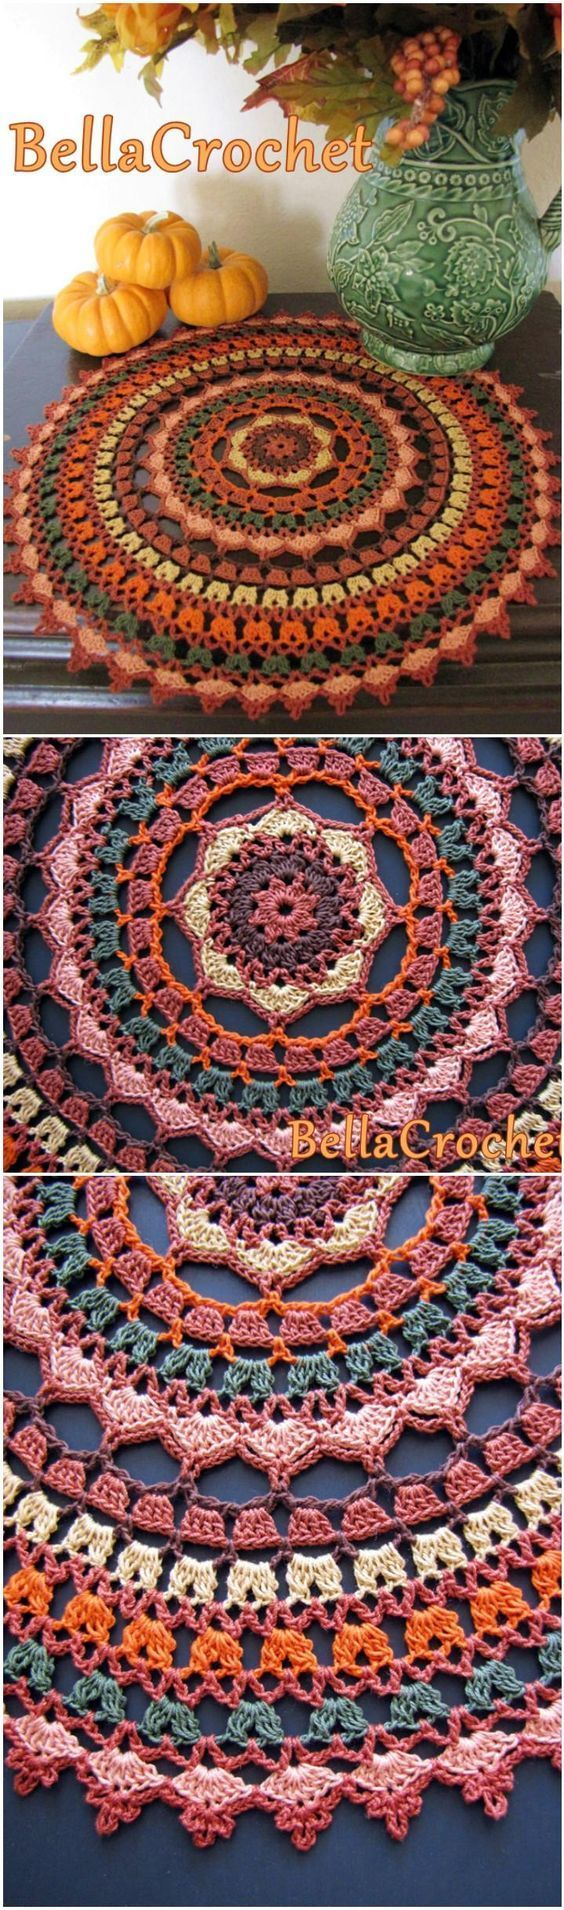 Crochet Autumn Spice Mandala Doily - 60+ Free Crochet Mandala Patterns